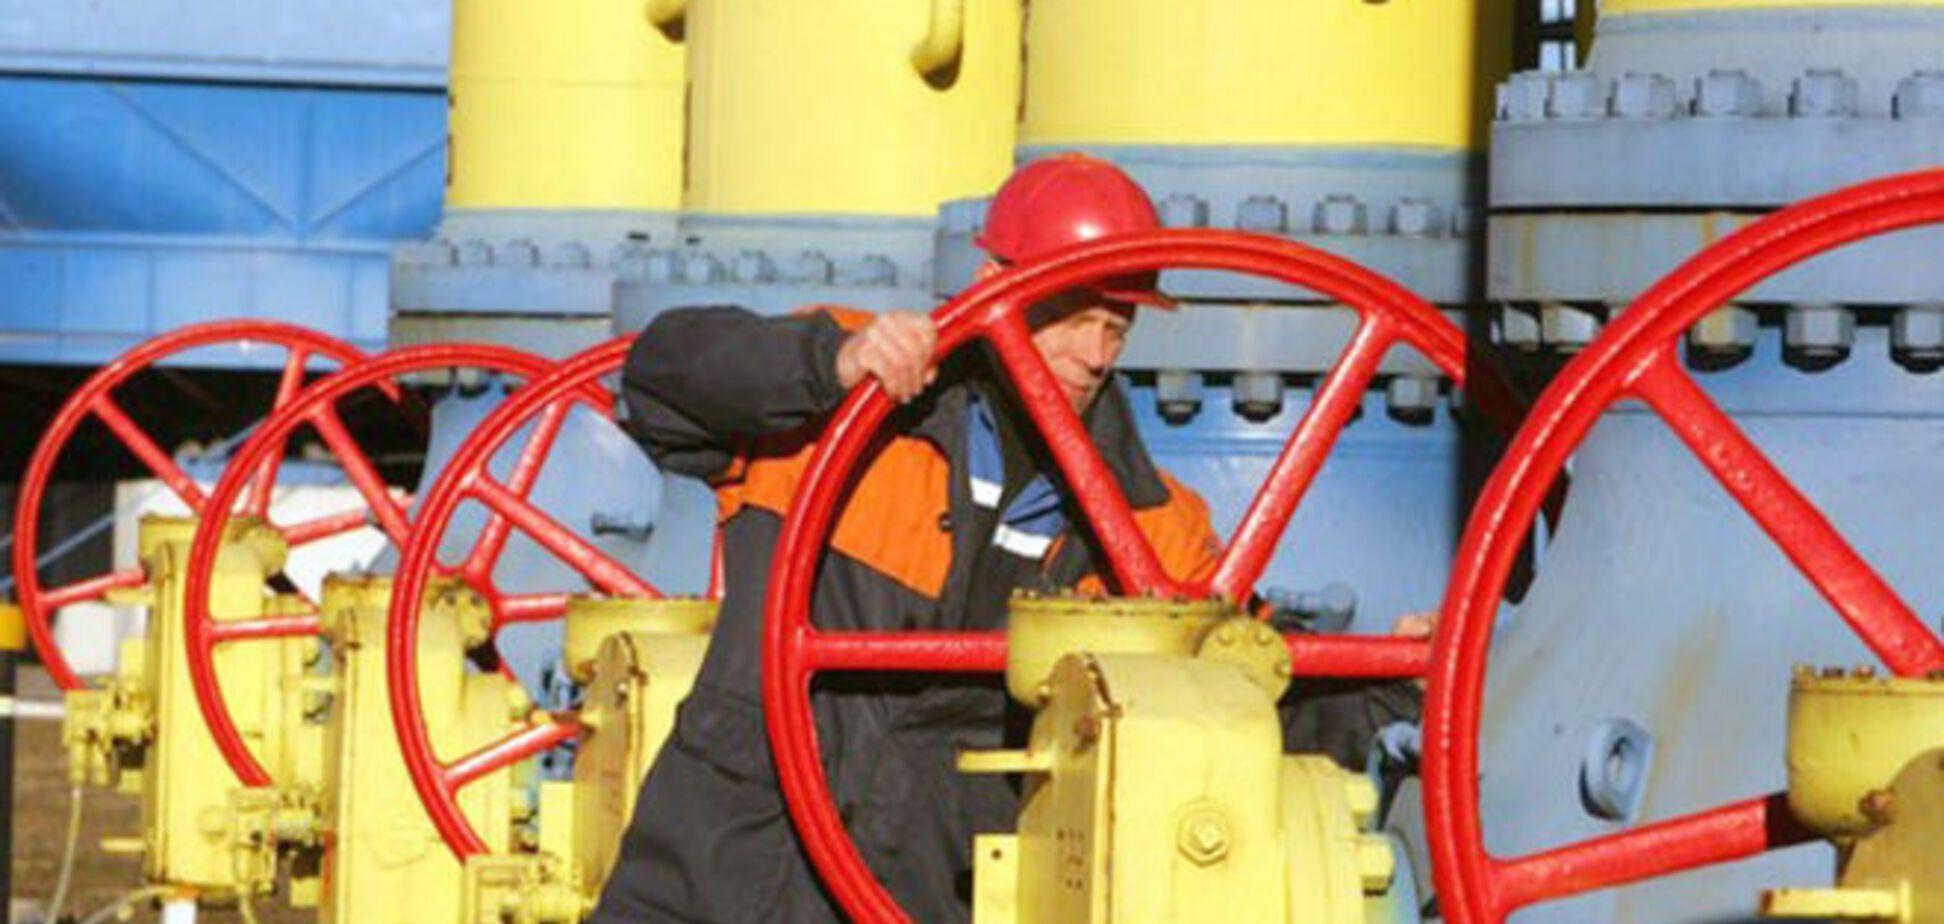 Експерт про видобуток газу: Україна може отримати 800 млрд грн